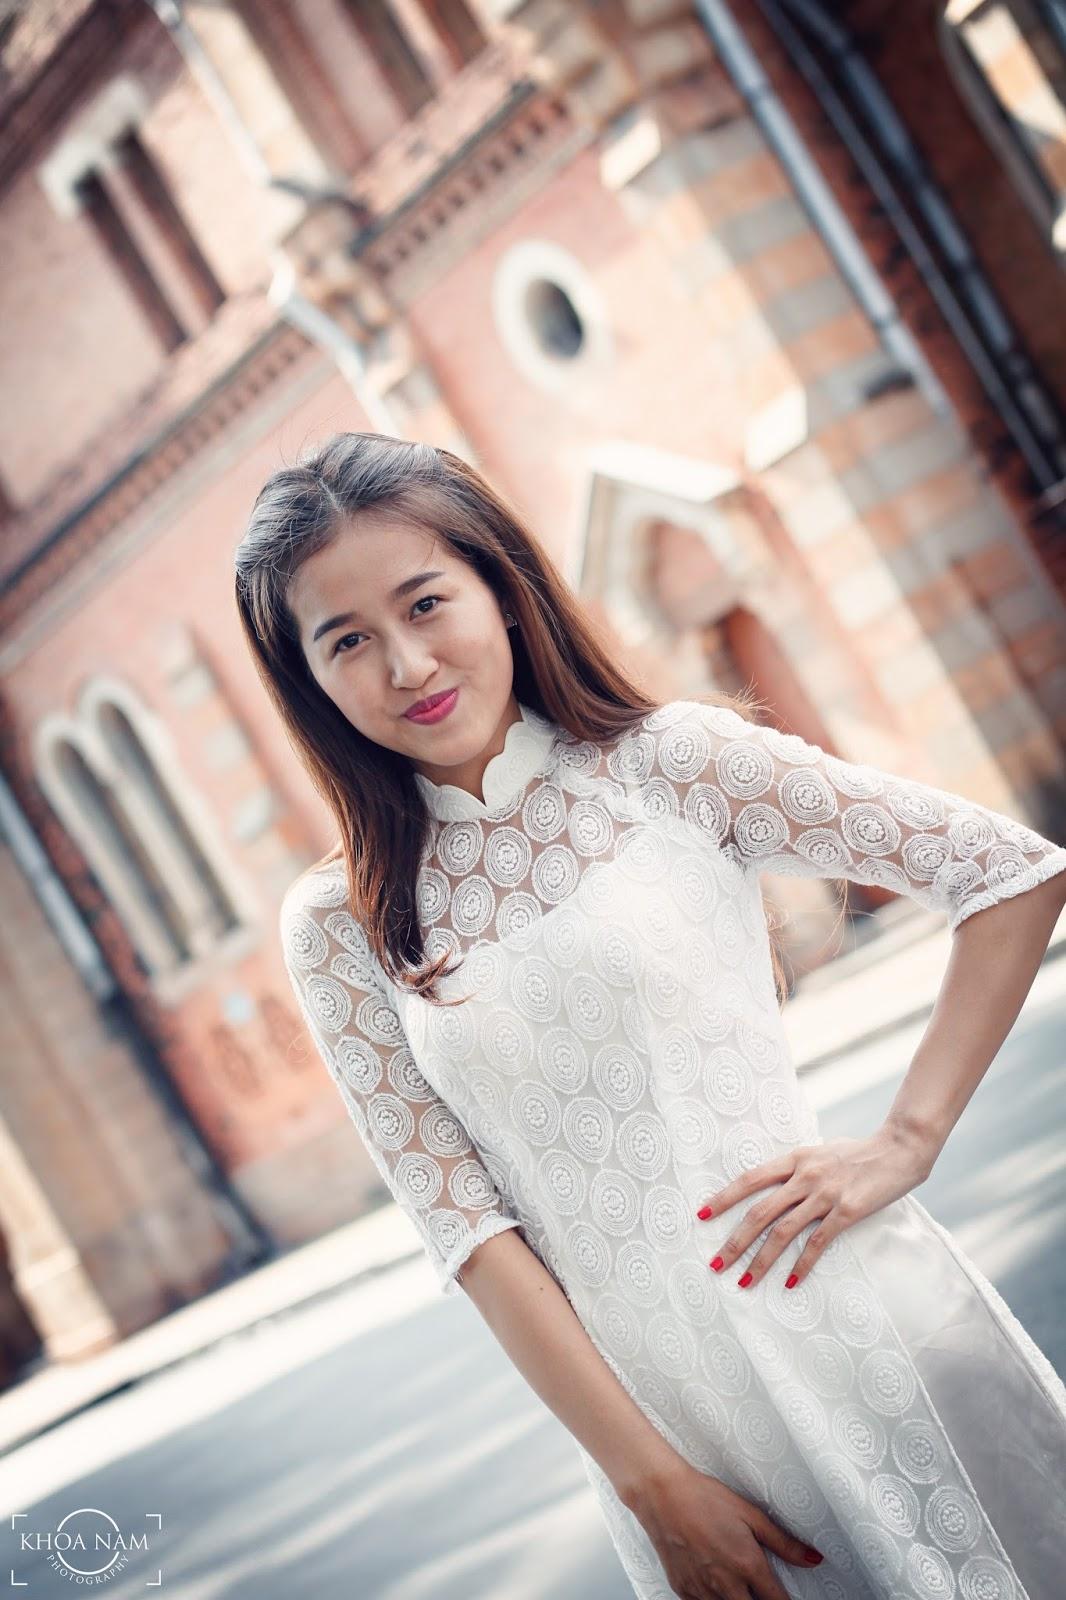 Vietnamese Beauty Girls by Khoa Nam Part 3 (76 pics)